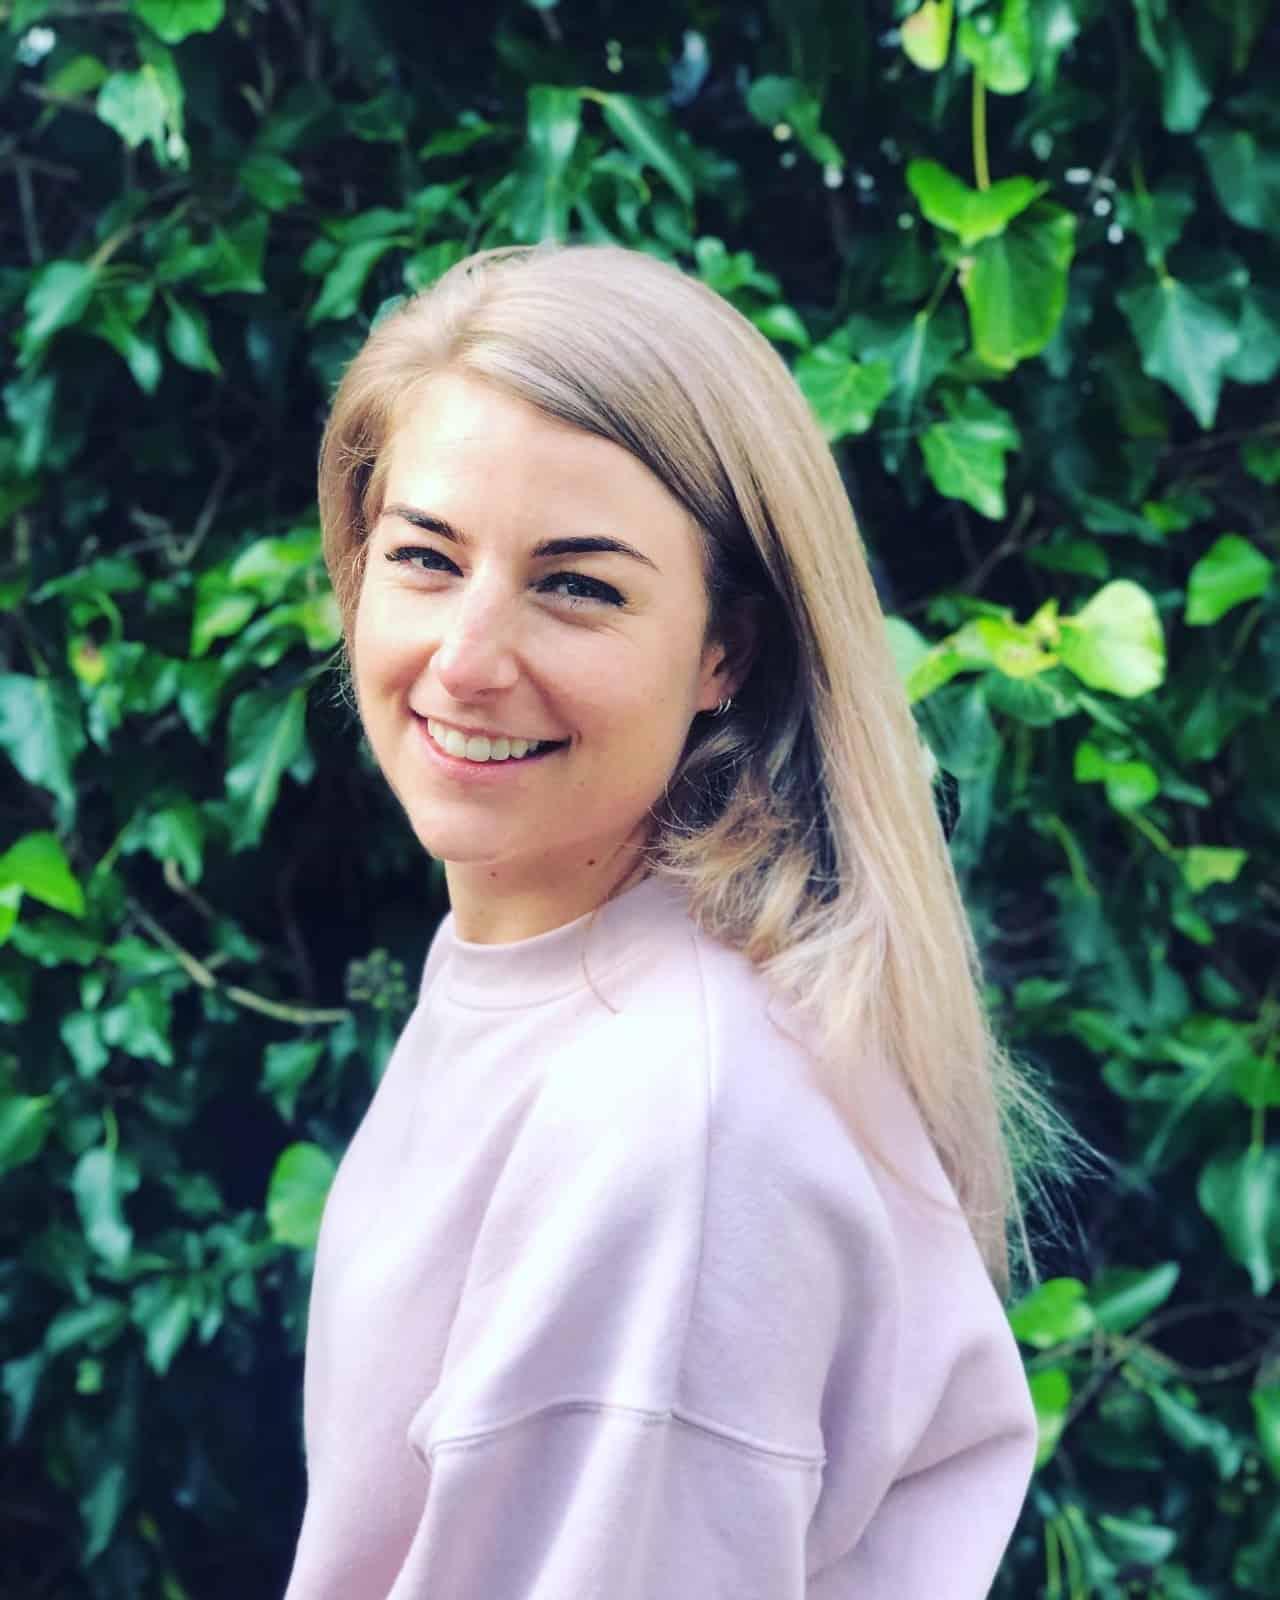 Saskia Kaptijn: 'I stay here'